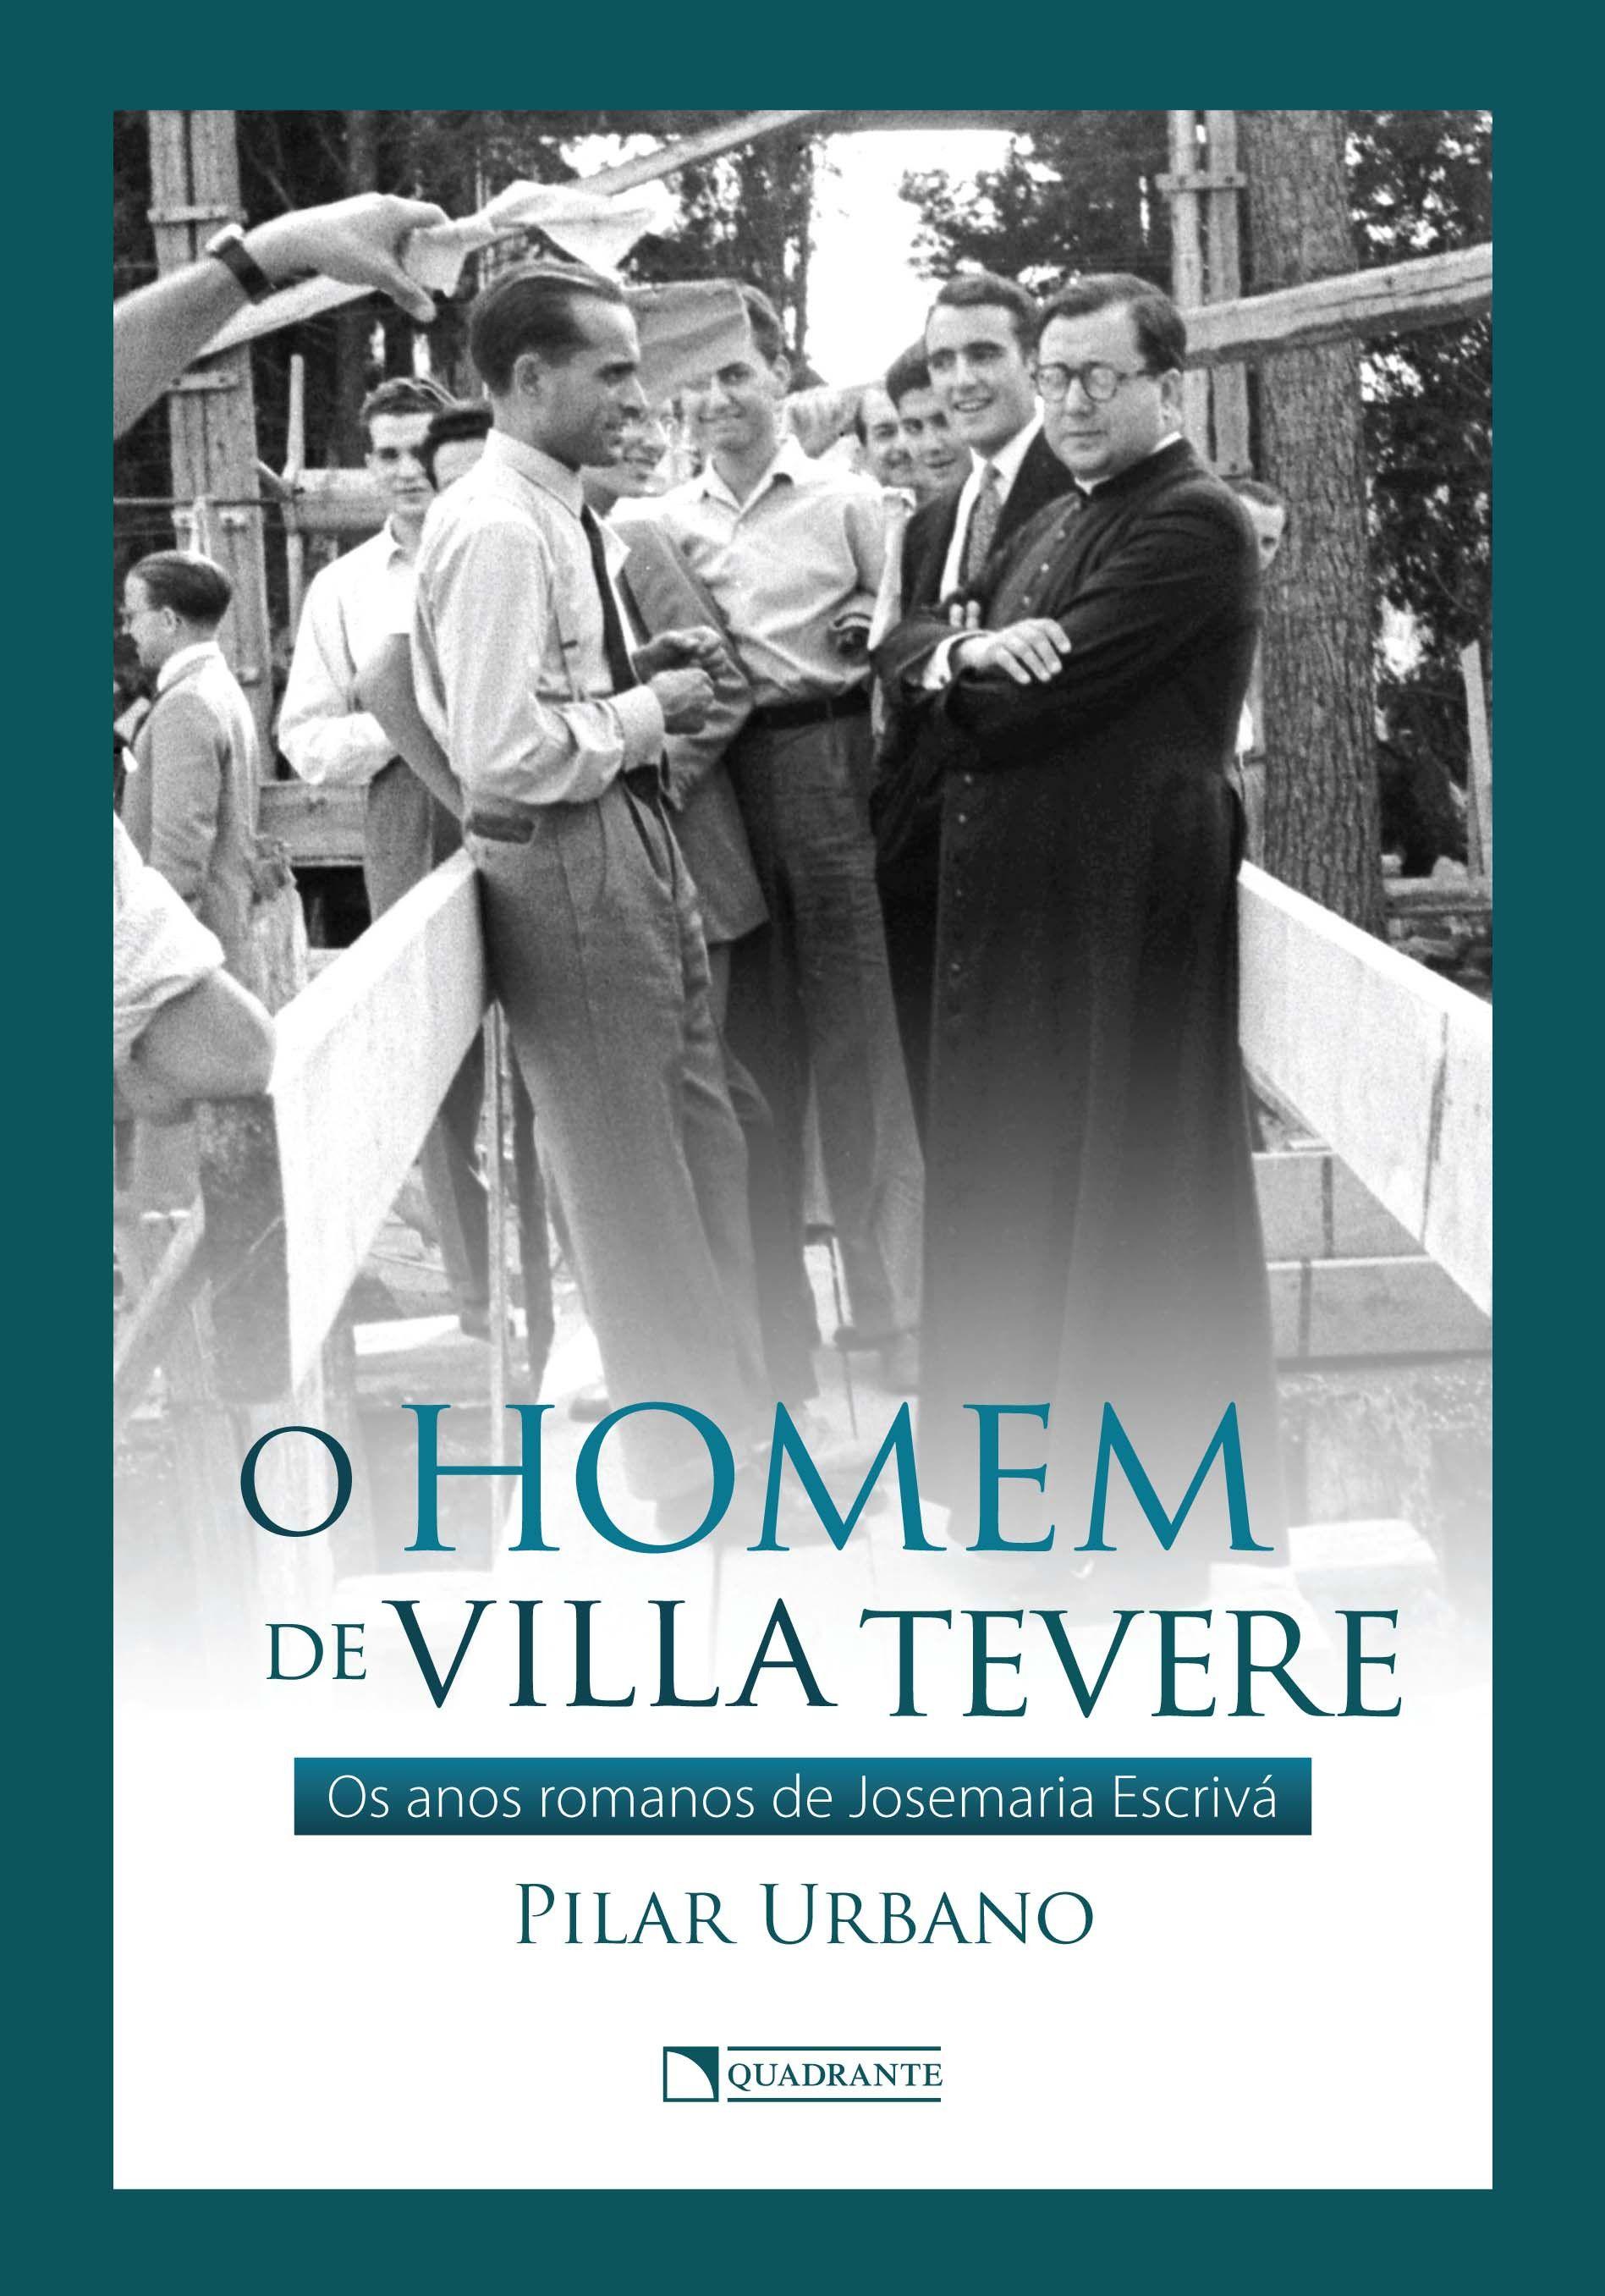 Livro O Homem de Villa Tevere